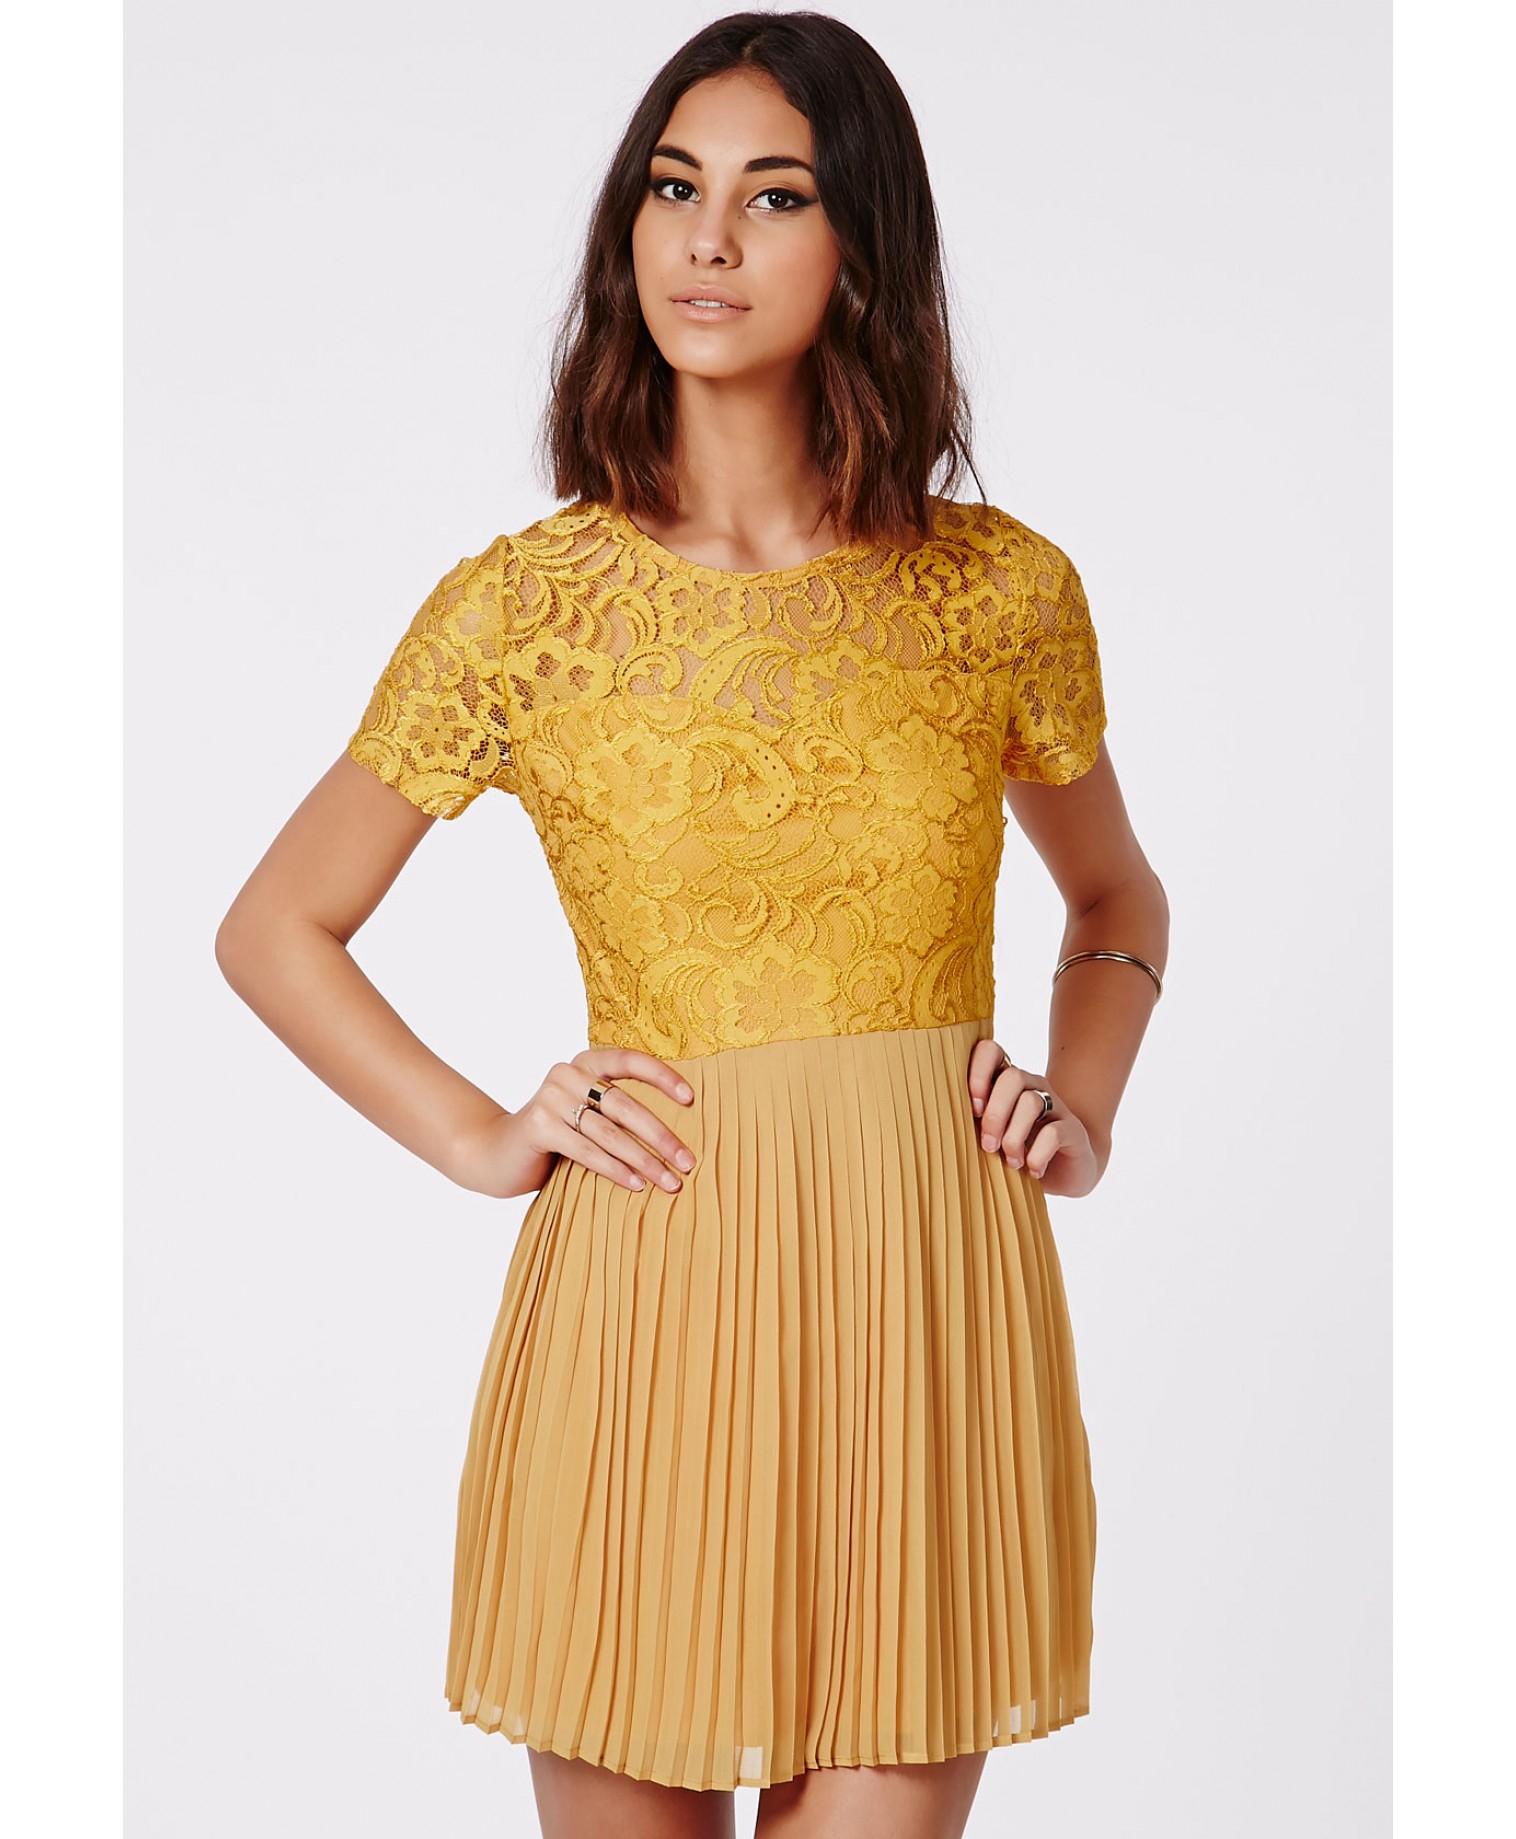 lyst missguided jensine pleated skirt lace skater dress